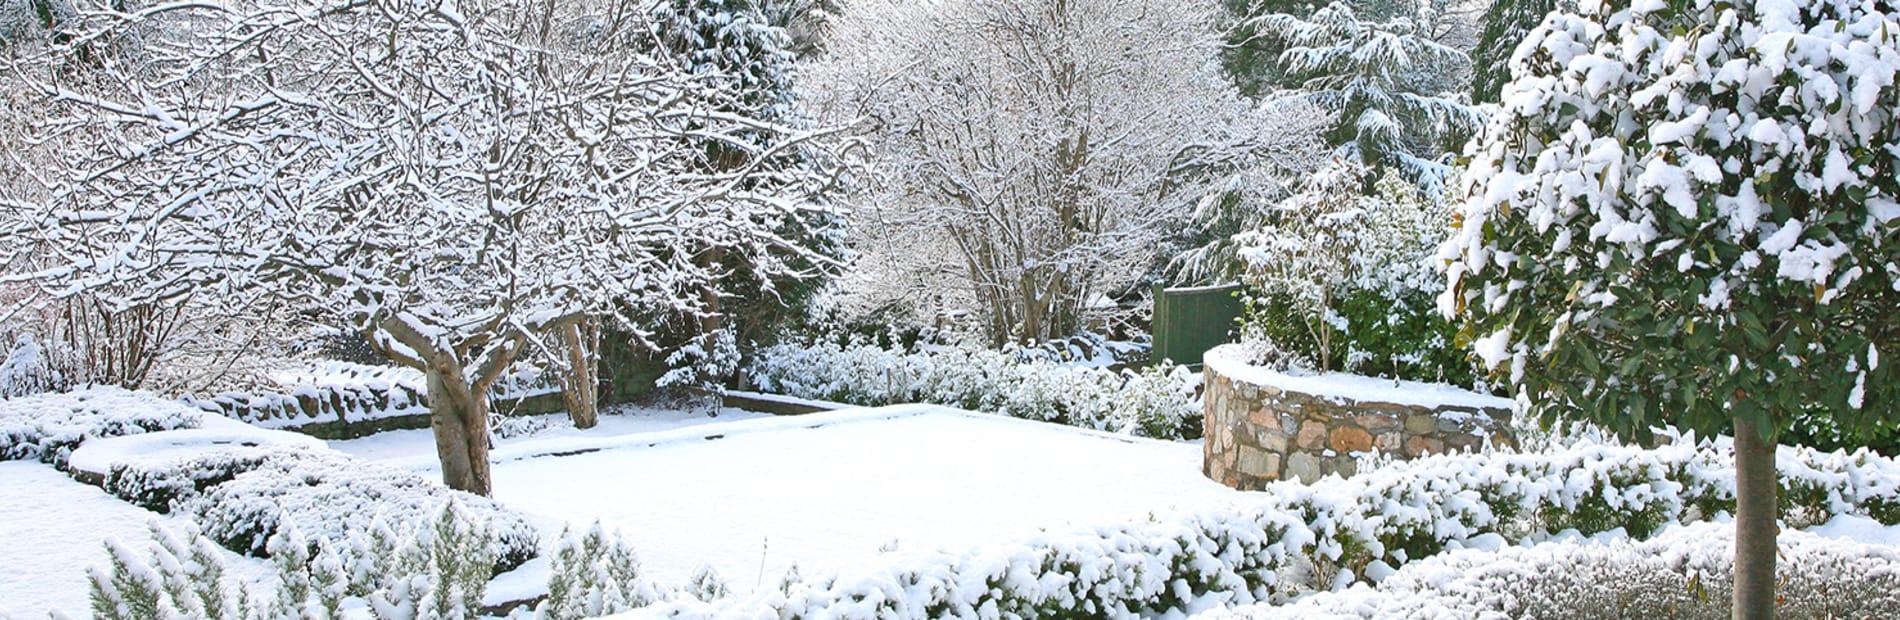 Snow on a tree